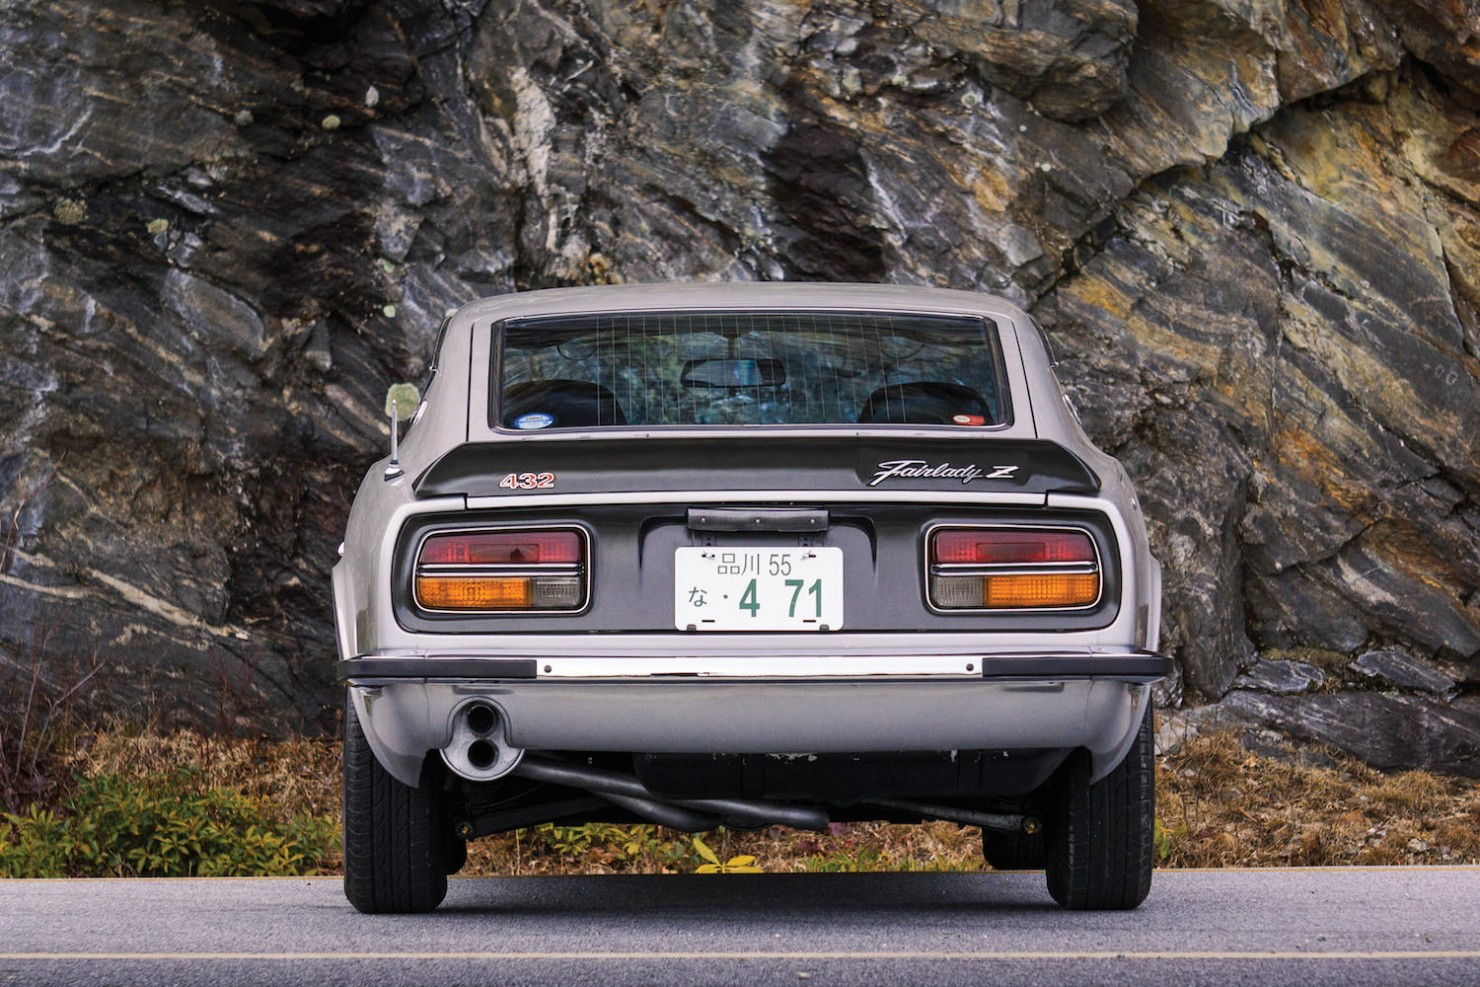 Nissan-Fairlady-Z-432-16